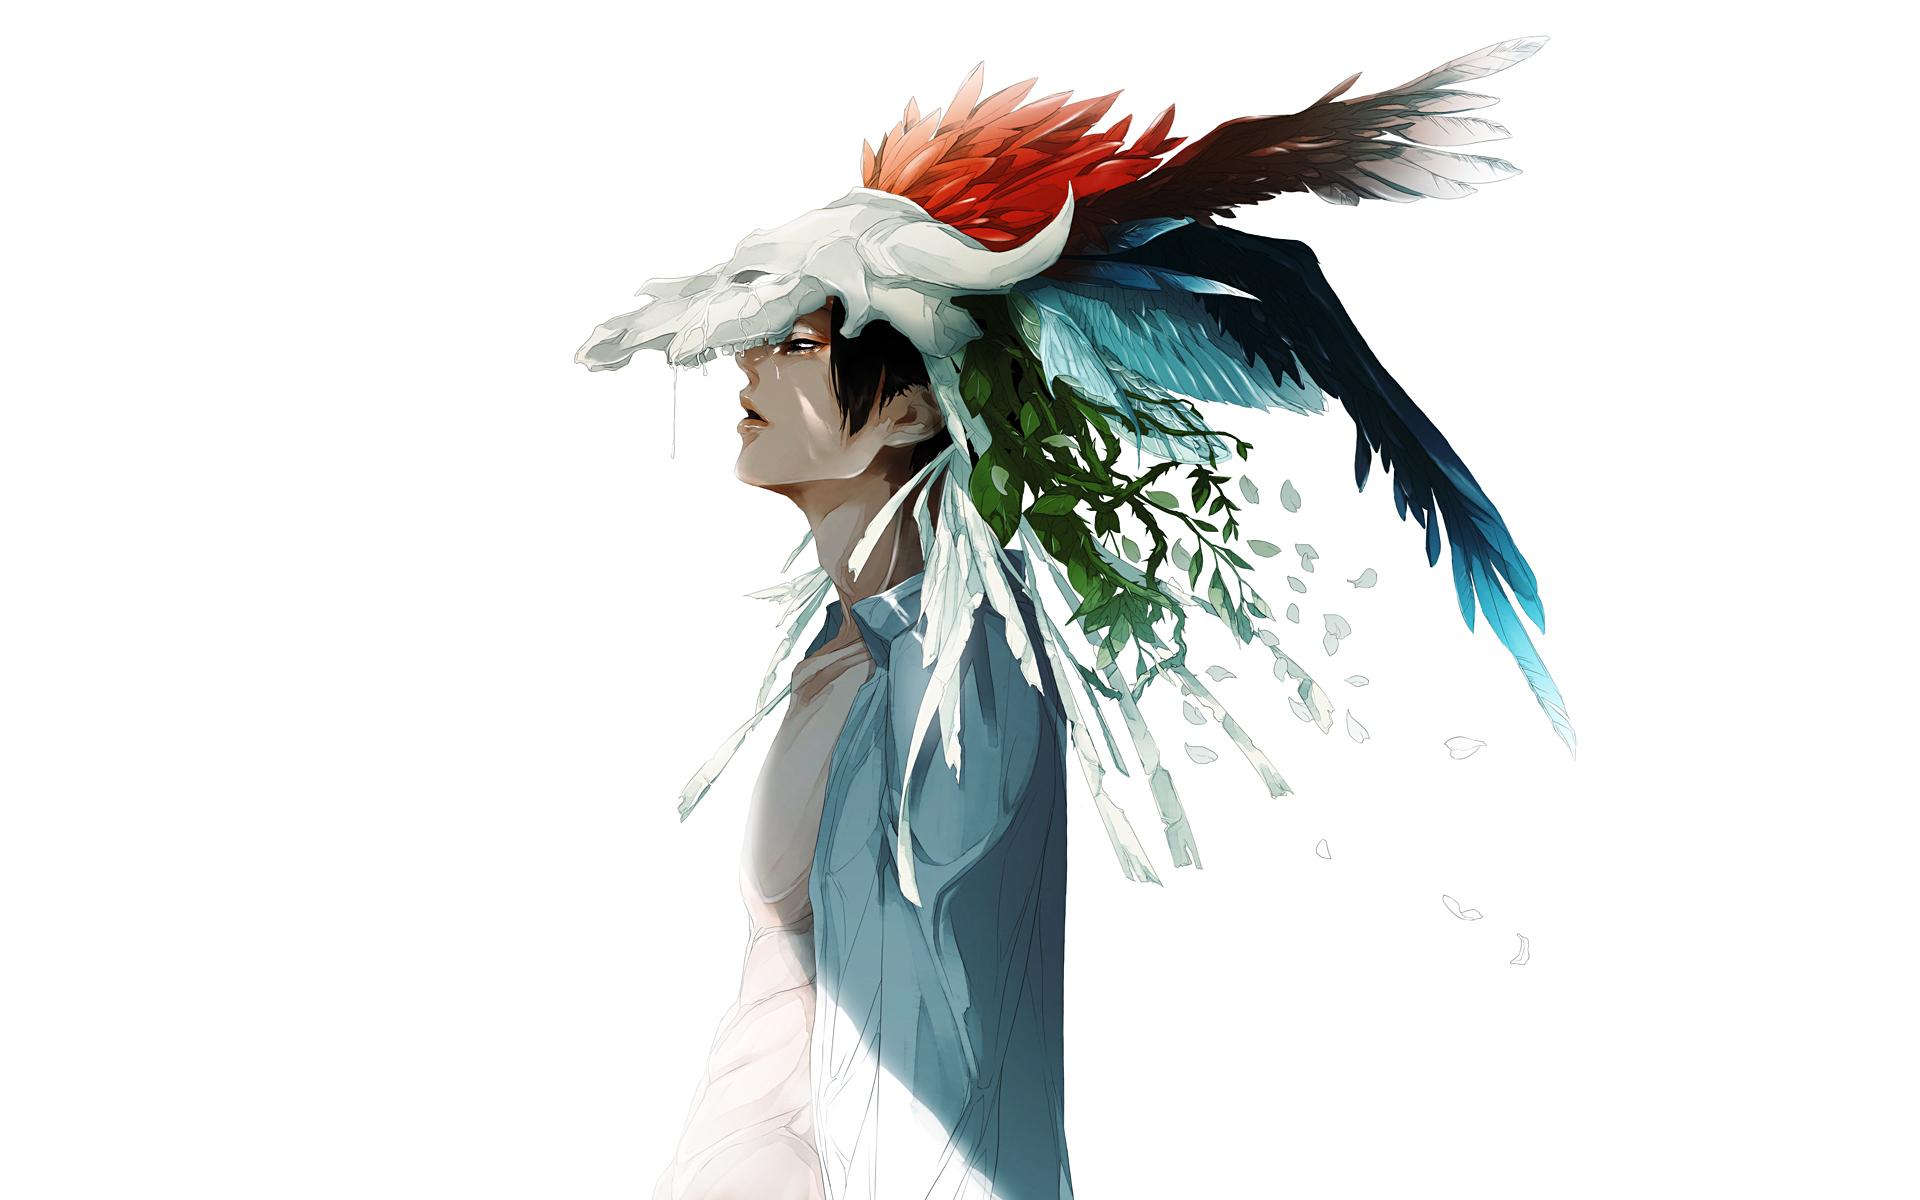 Anime Boy Cool Feather Sadness Art Watercolor Wallpaper 1920x1200